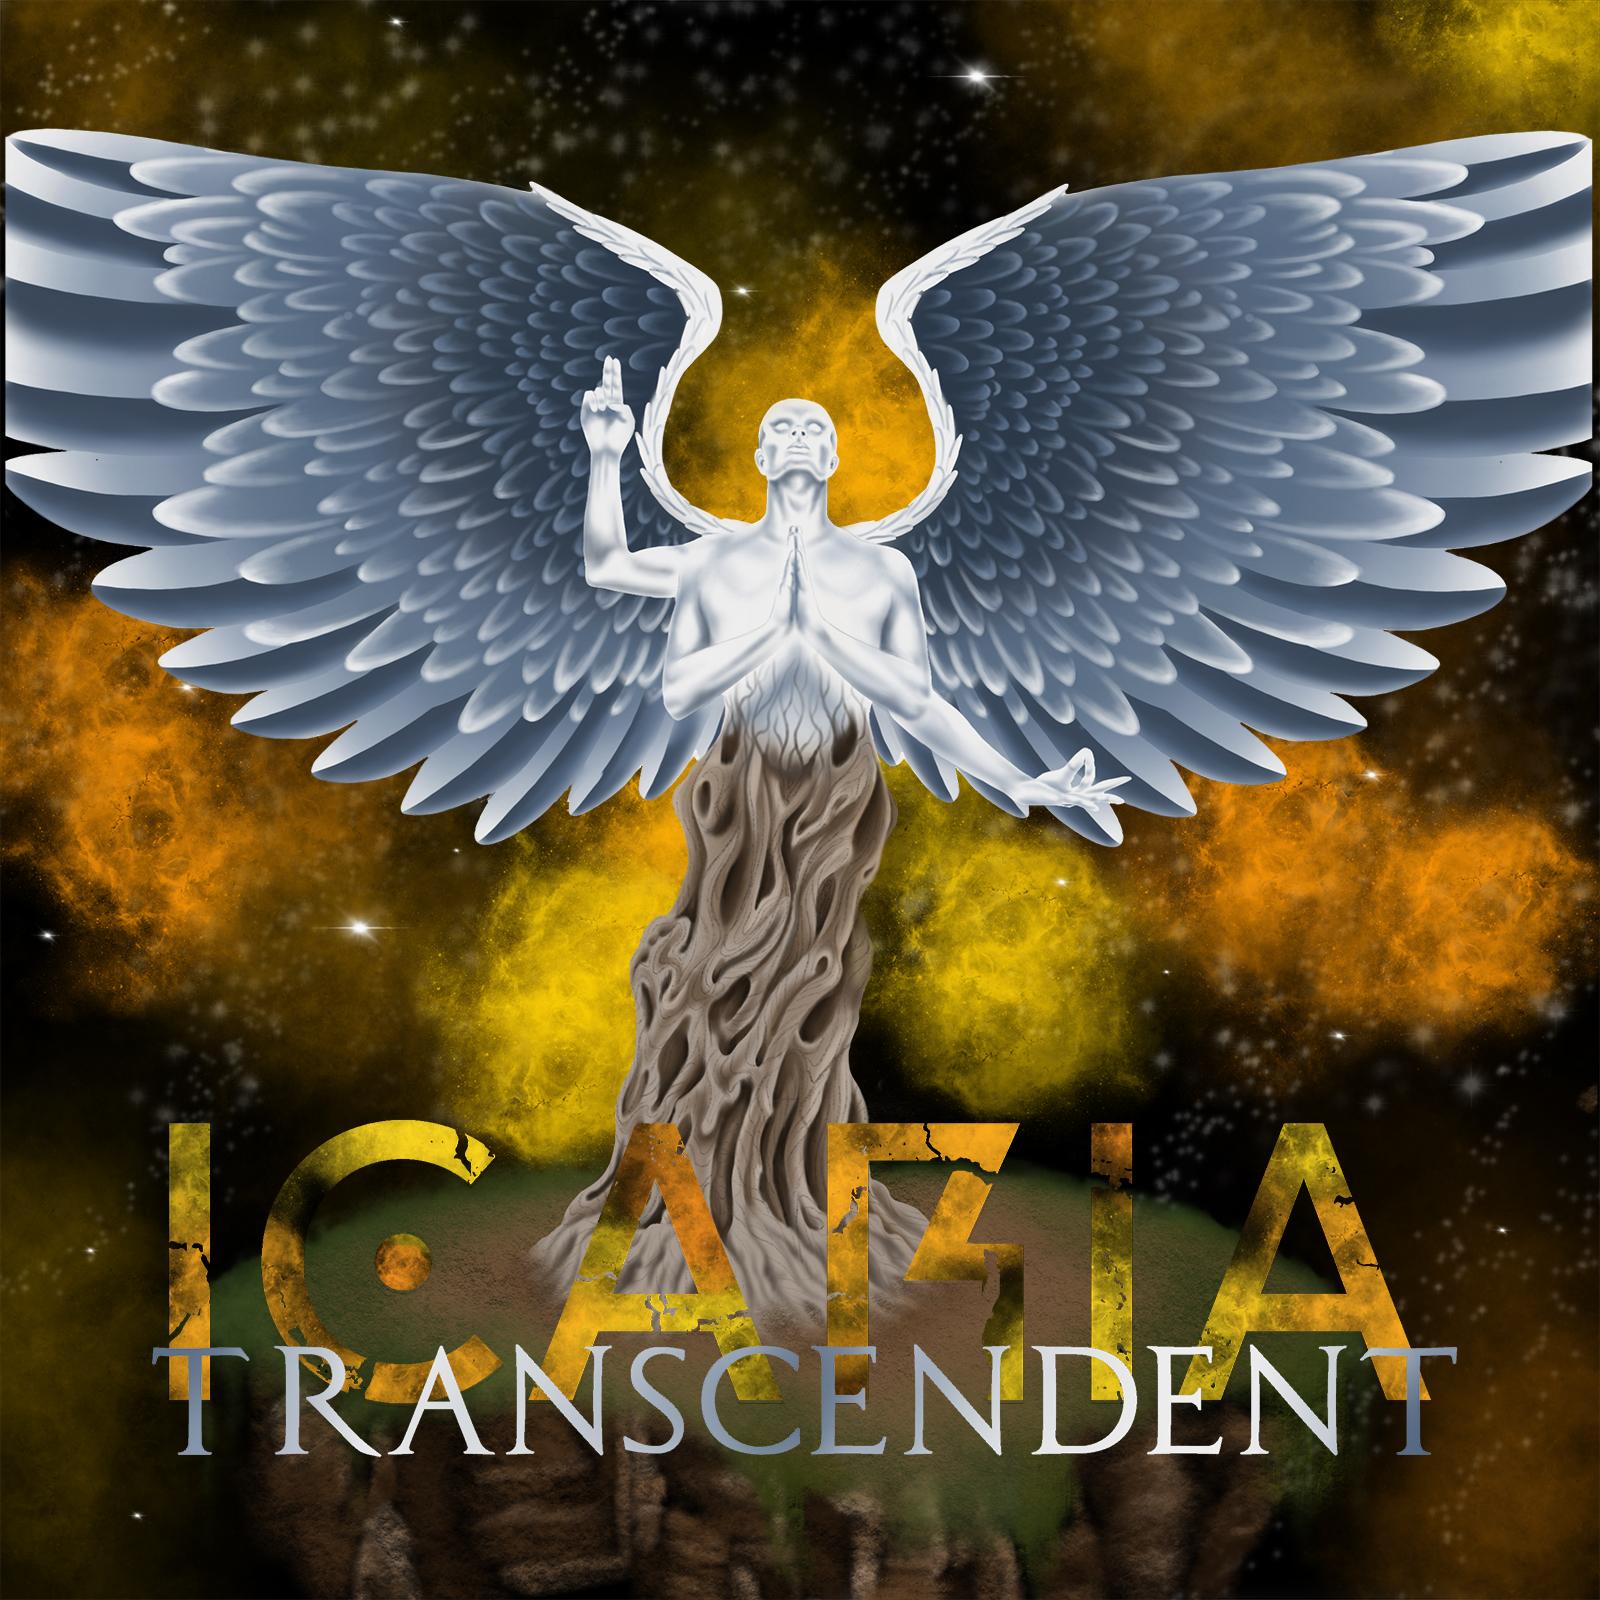 Icaria - 'Transcendent'